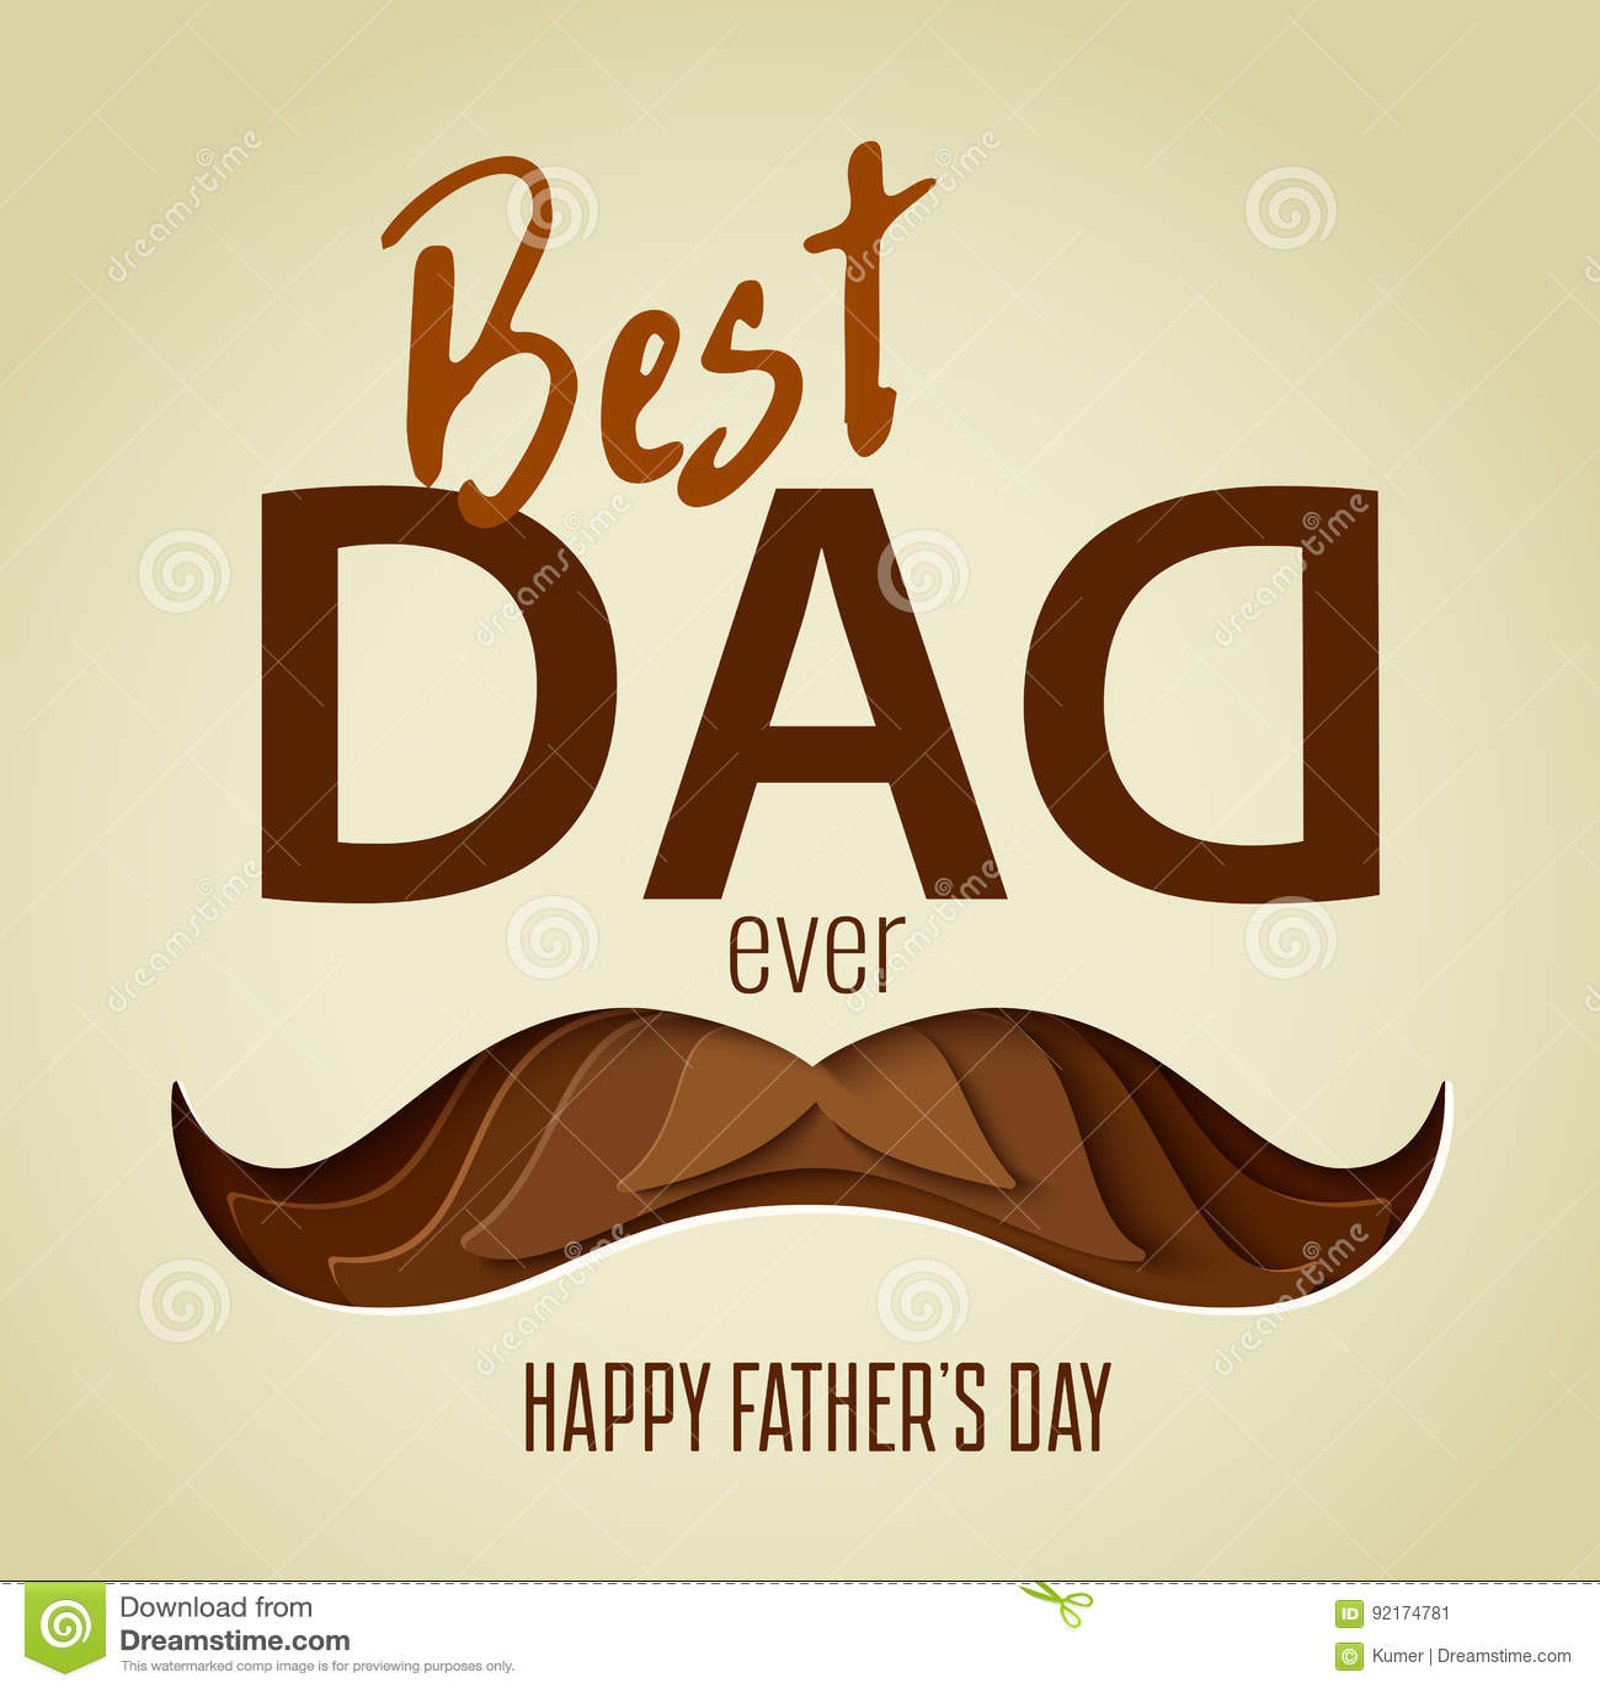 Best Dad Ever 3d Paper Cut Hipster Beard With Mustache ...